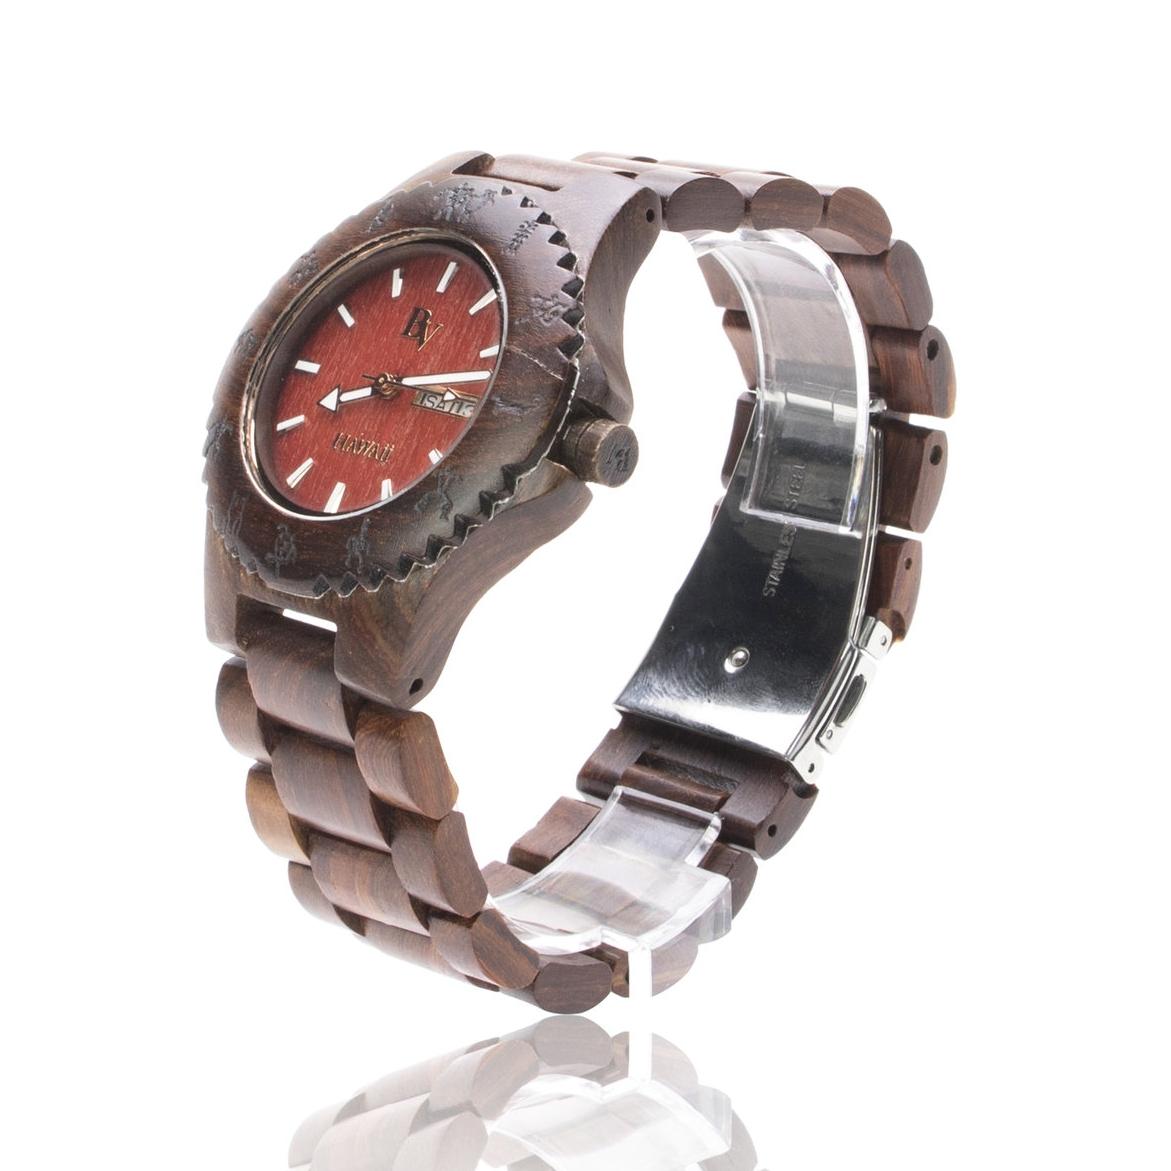 watch22-2.jpg